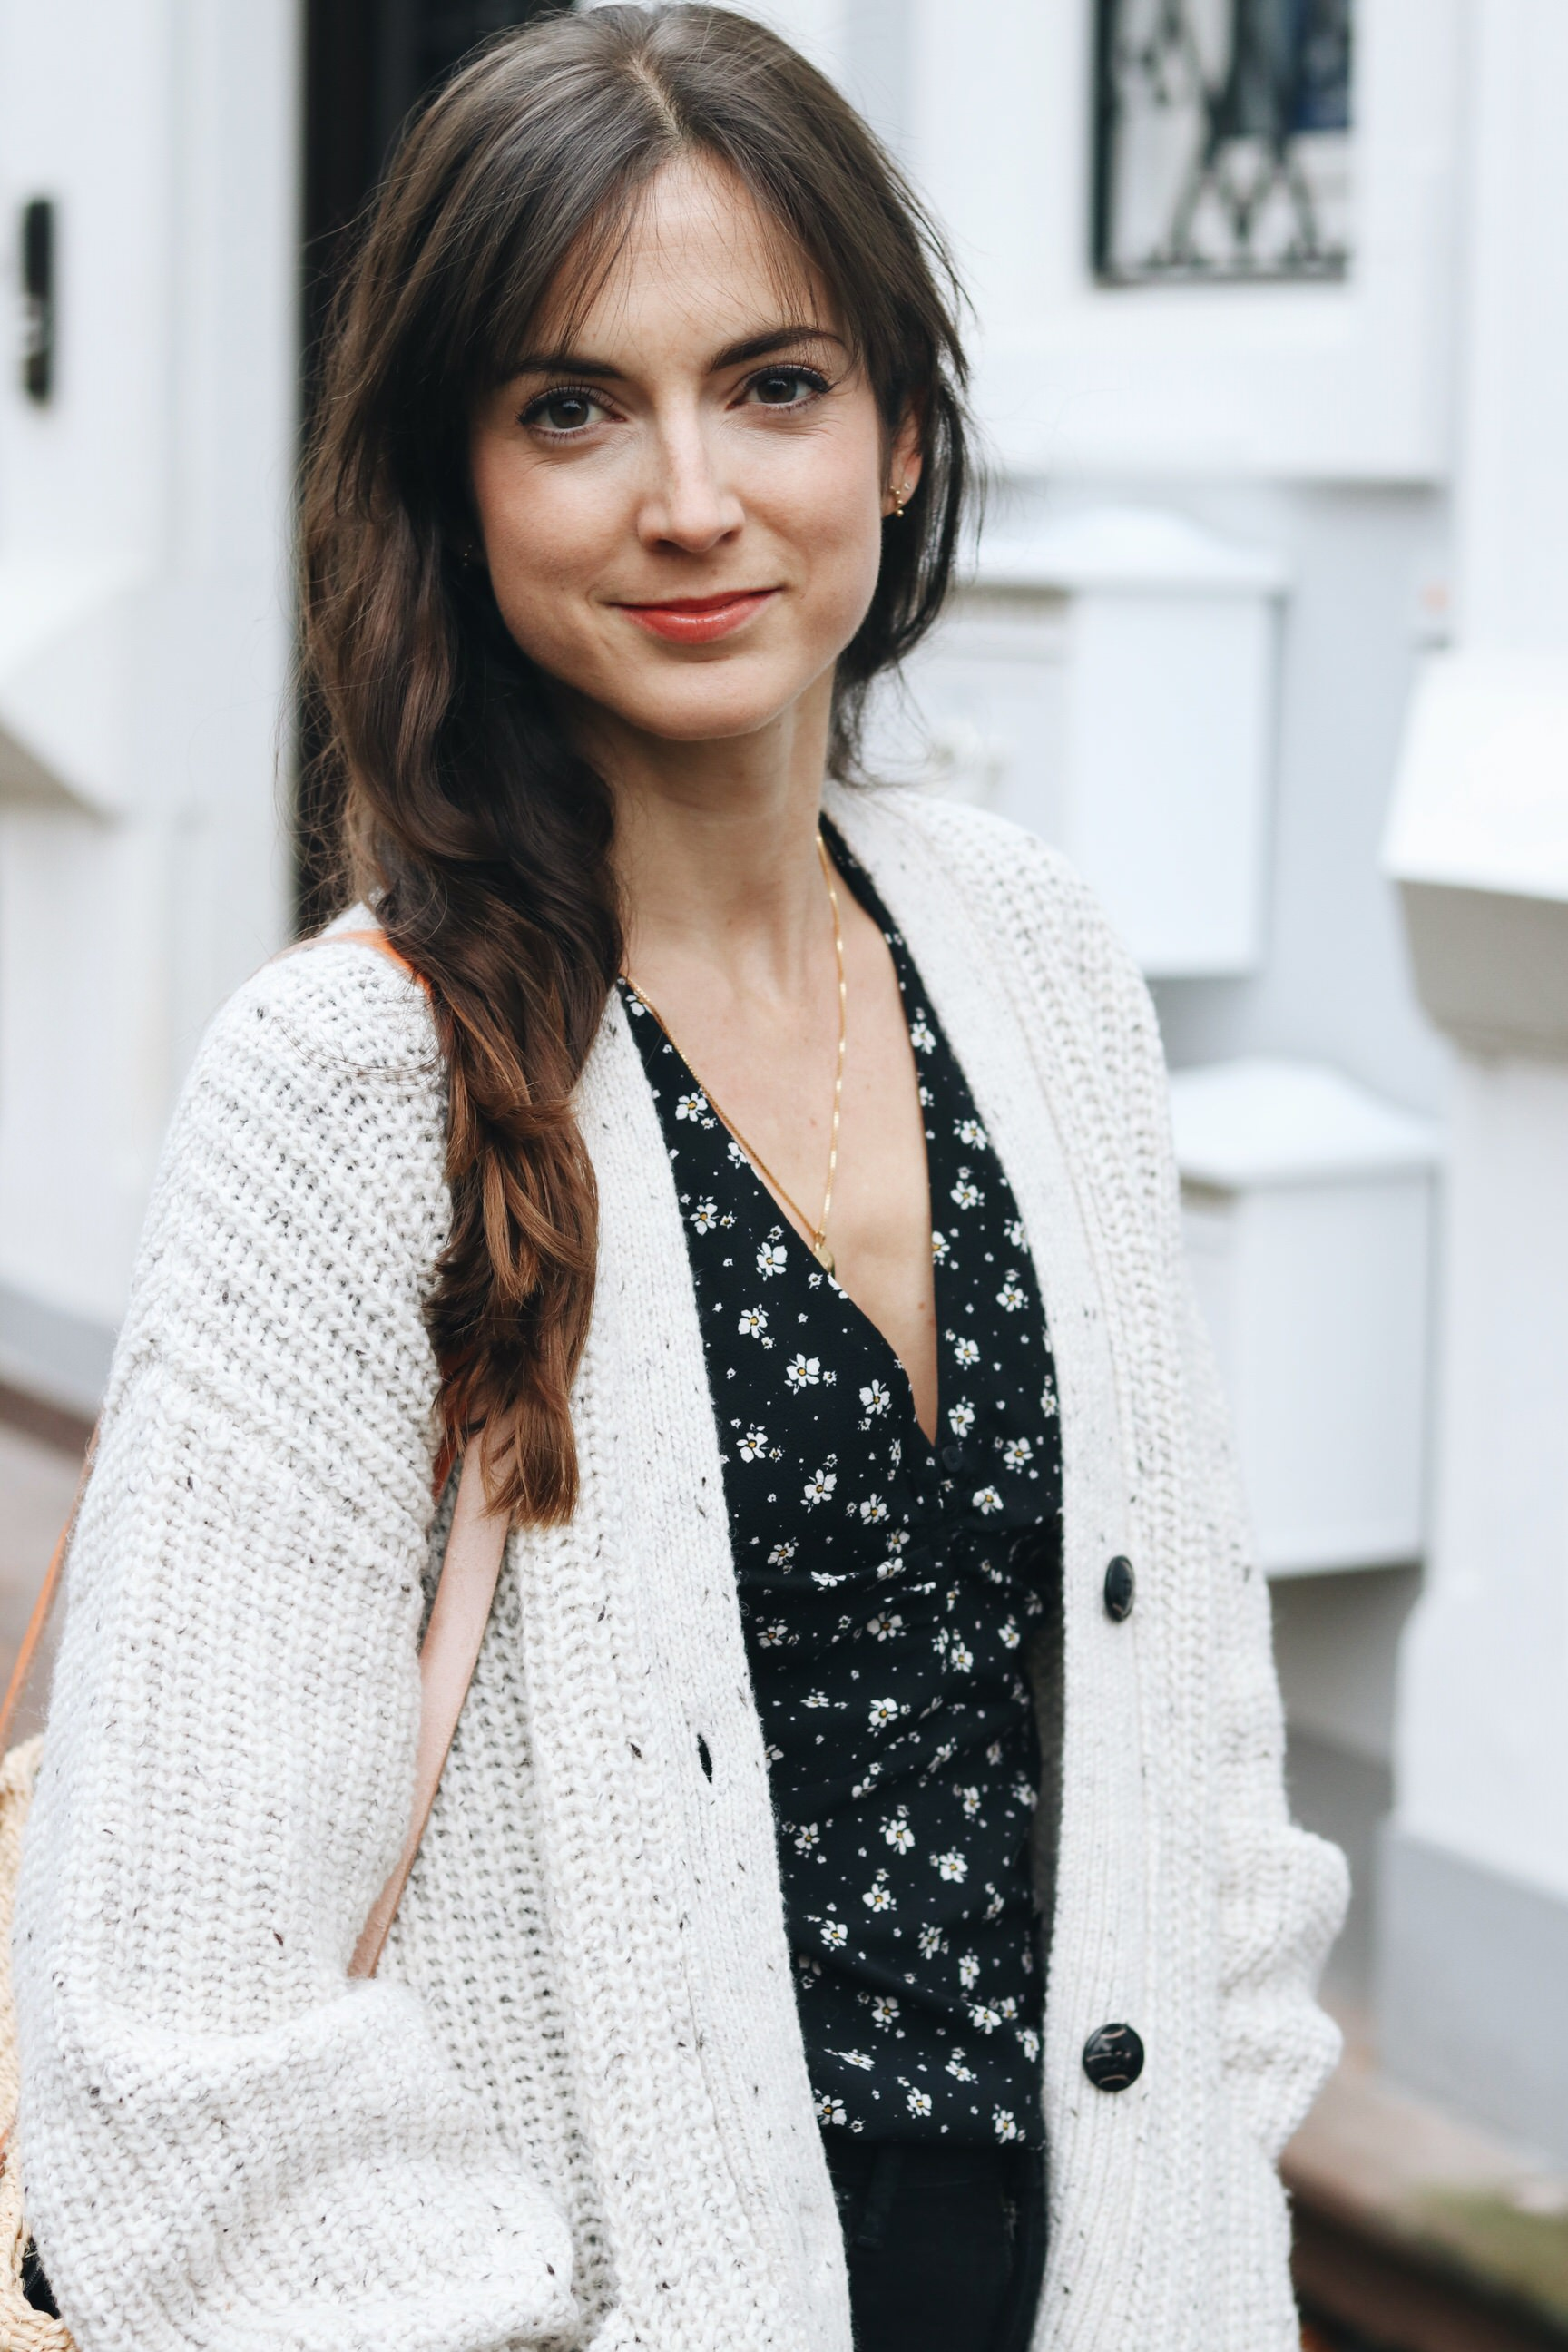 Neele Modebloggerin Modeblog deutsch